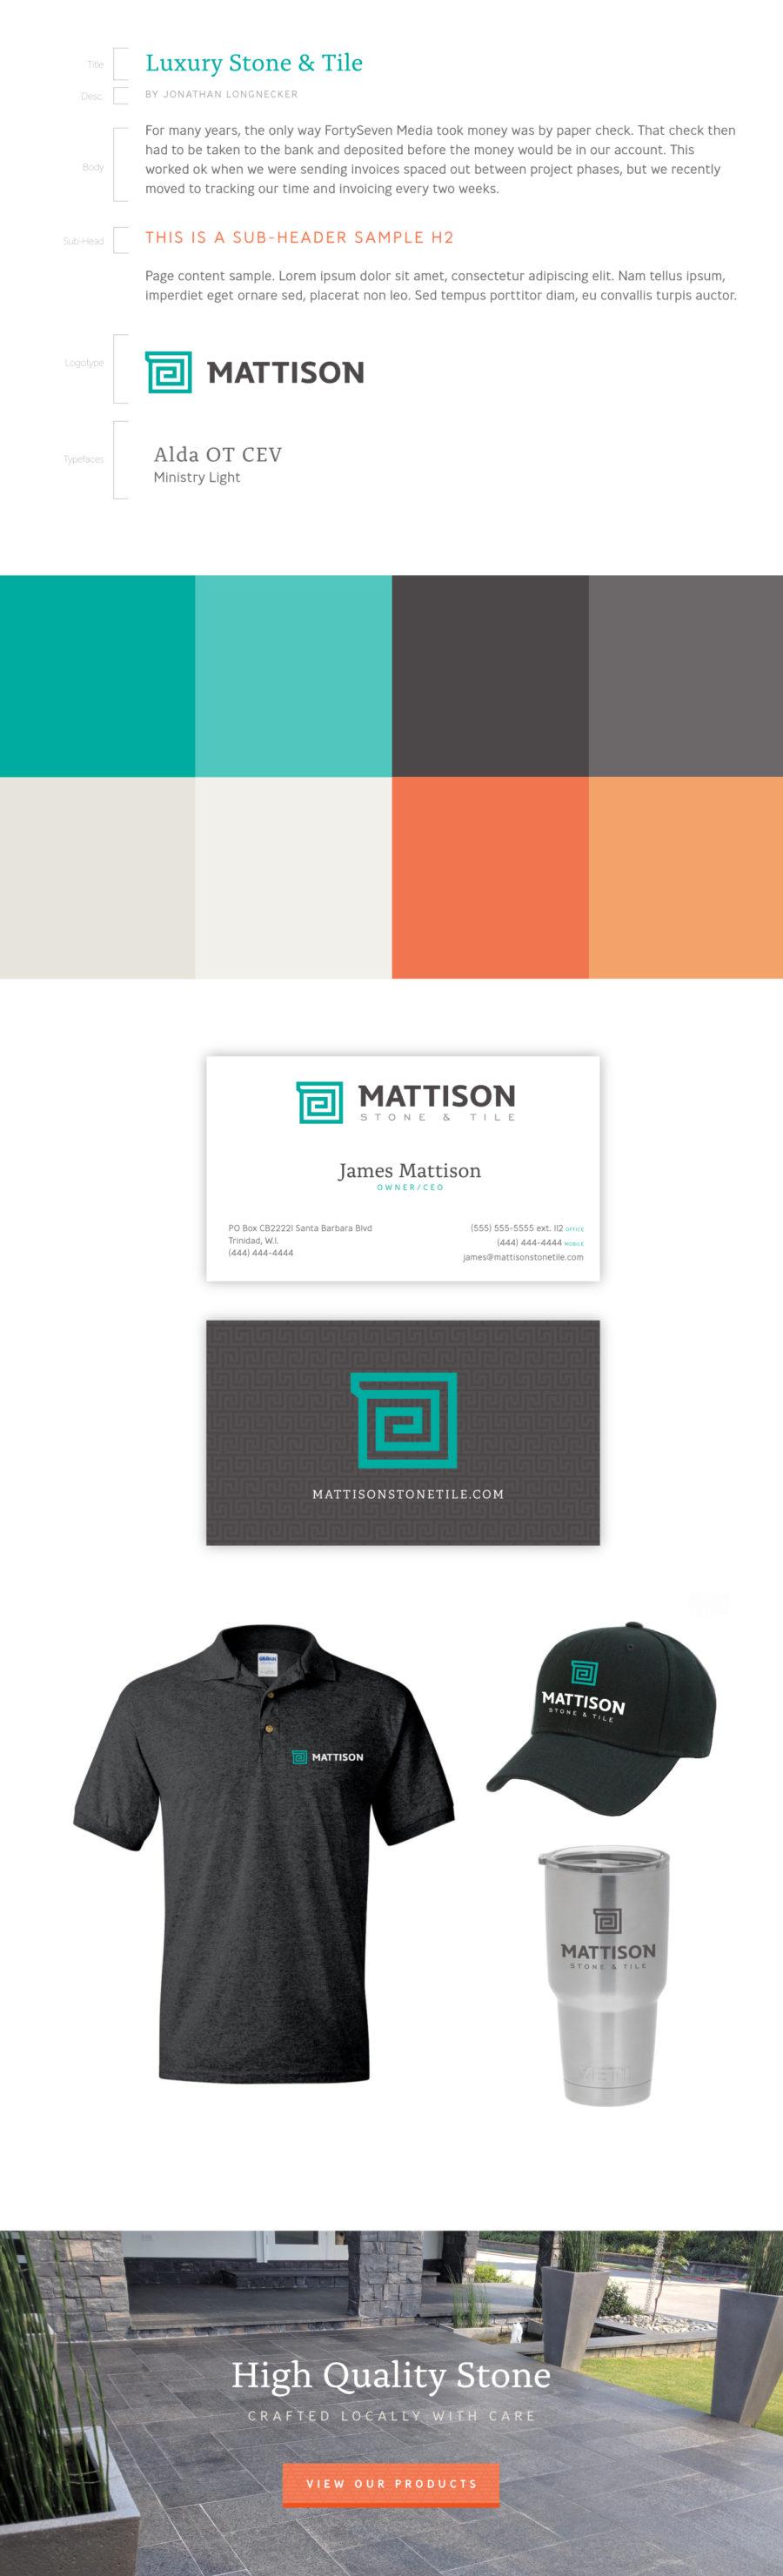 Mattison Branding Book